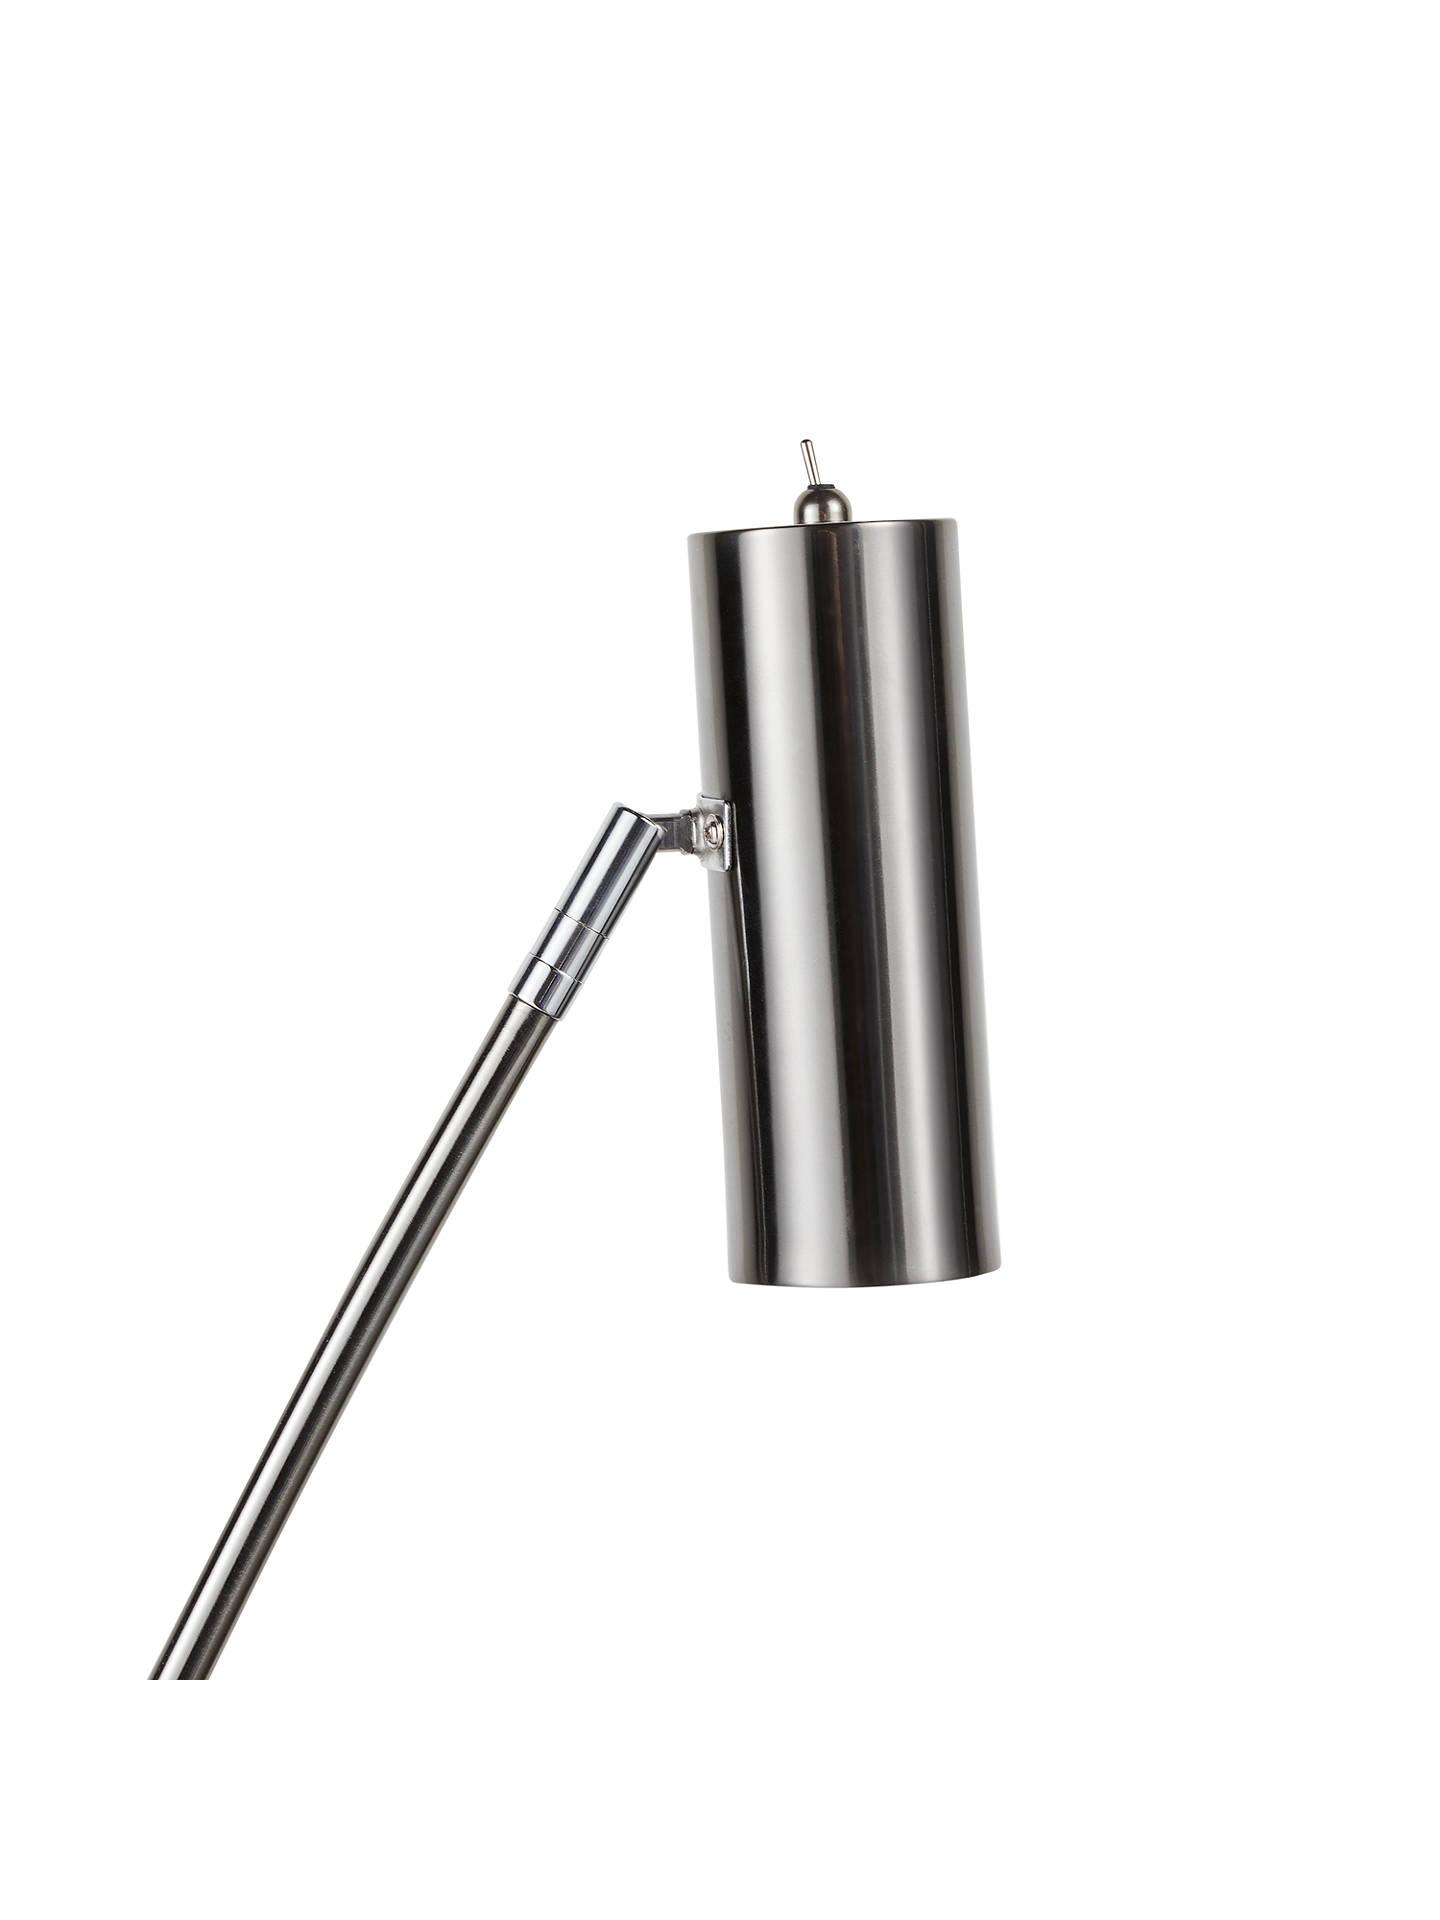 John Lewis Partners Louie Led Floor Lamp At Promotional Candle Circuit Buy Promotion Buyjohn Black Nickel Online Johnlewis